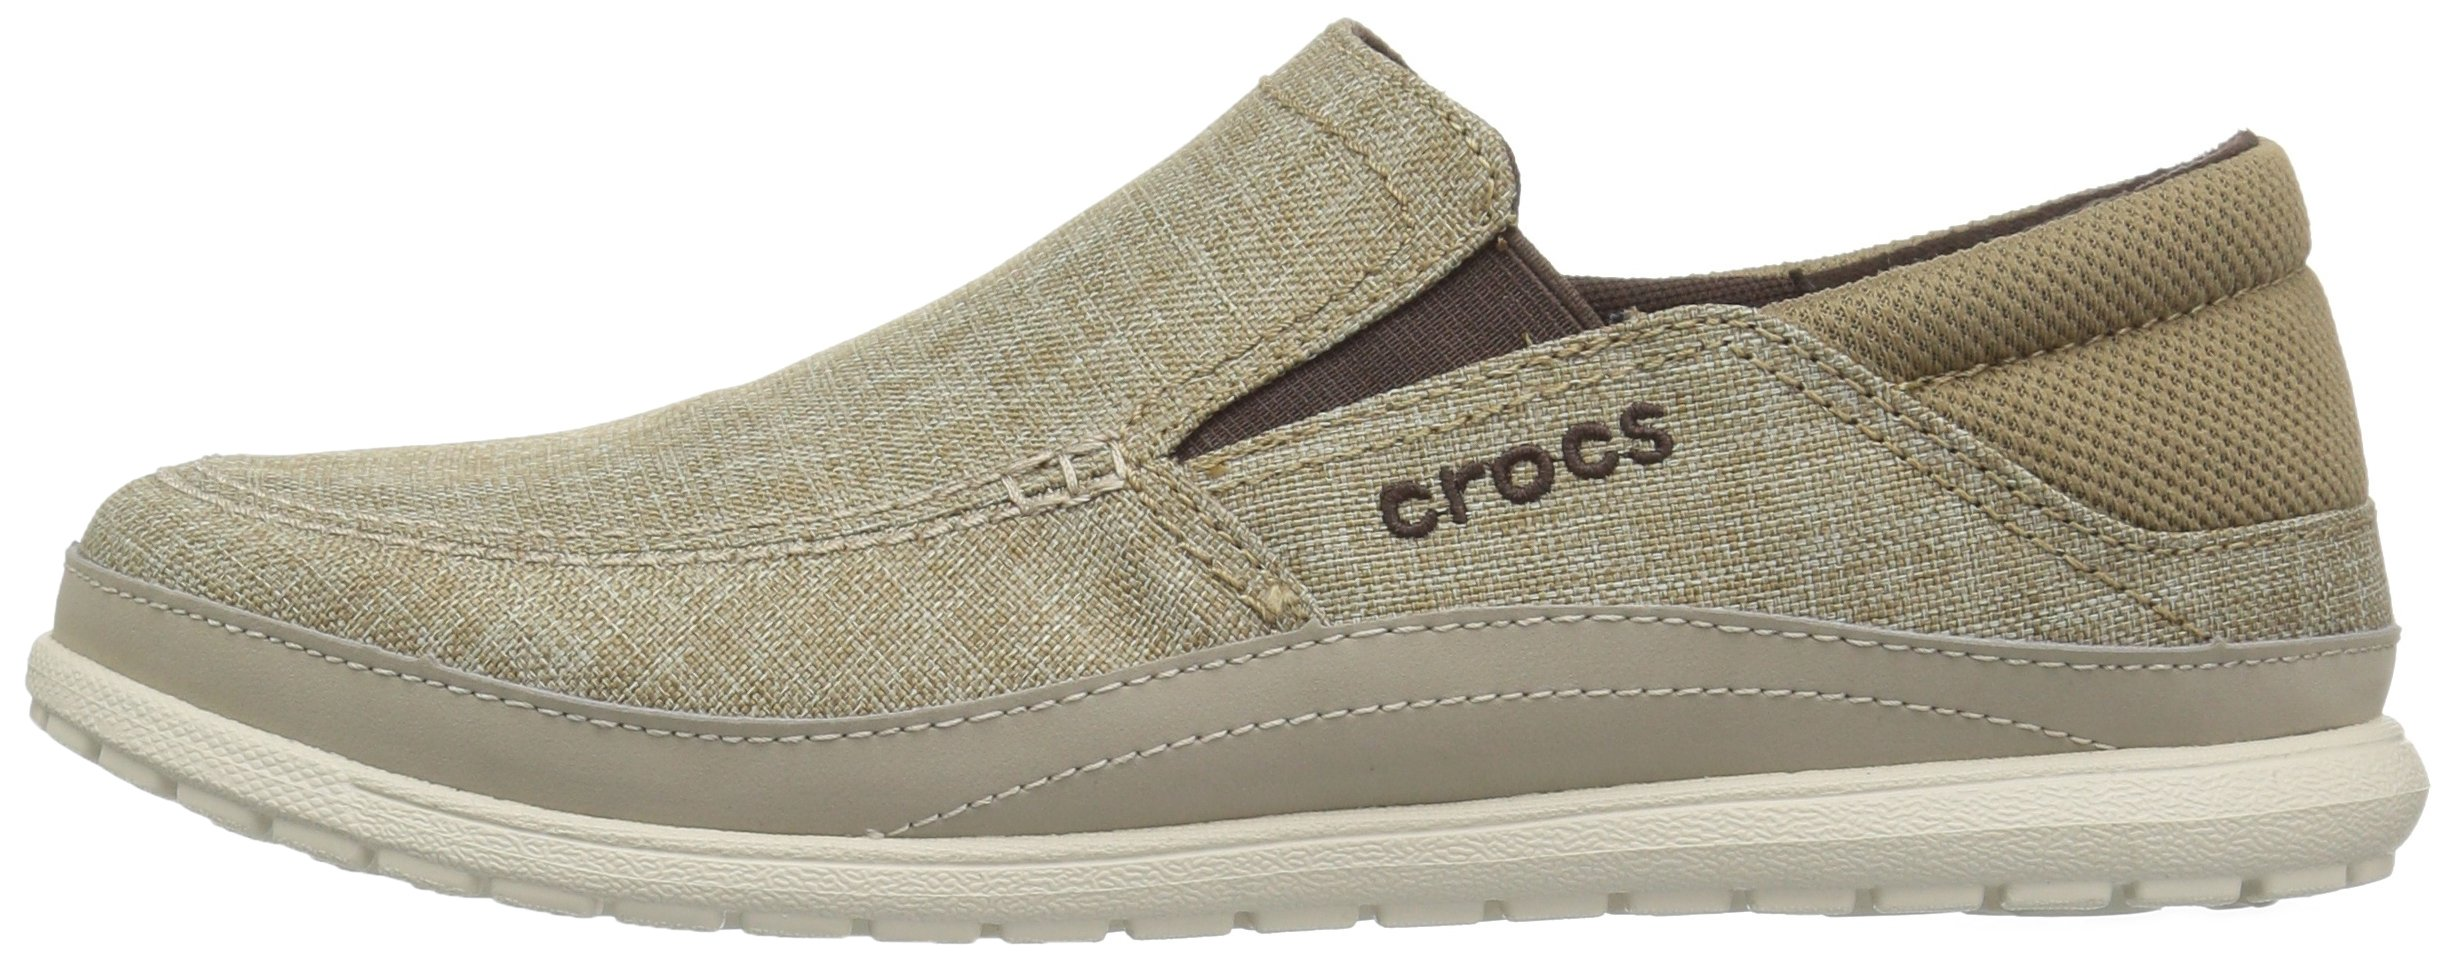 Crocs Men's Santa Cruz Playa Slip-On Loafer, Khaki/Stucco, 11 M US